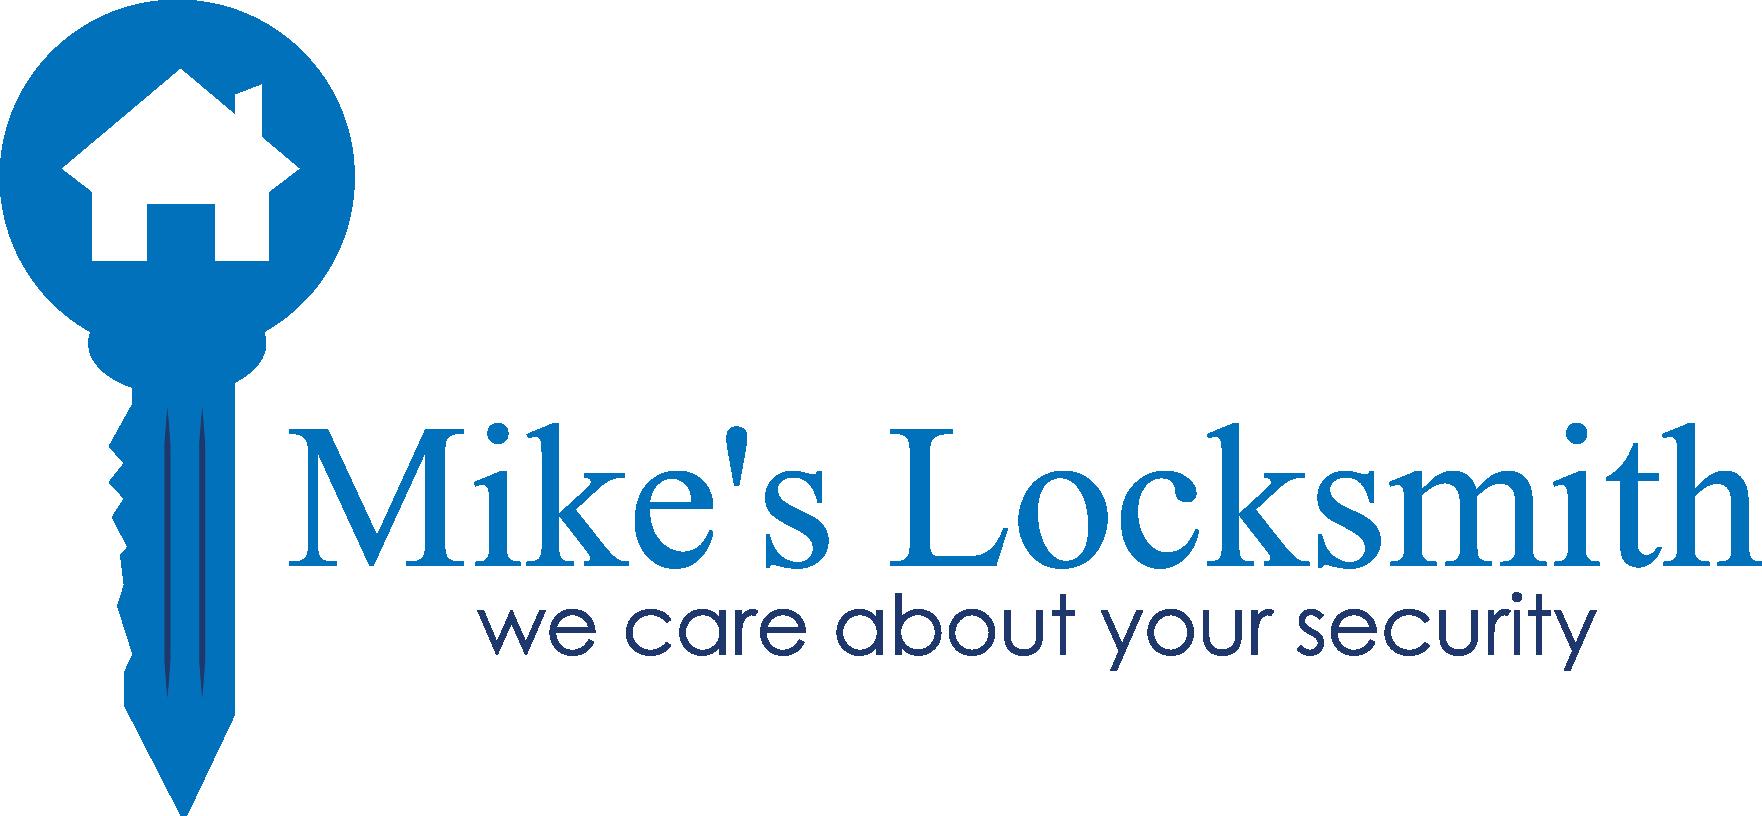 Mike's Locksmith Maryland